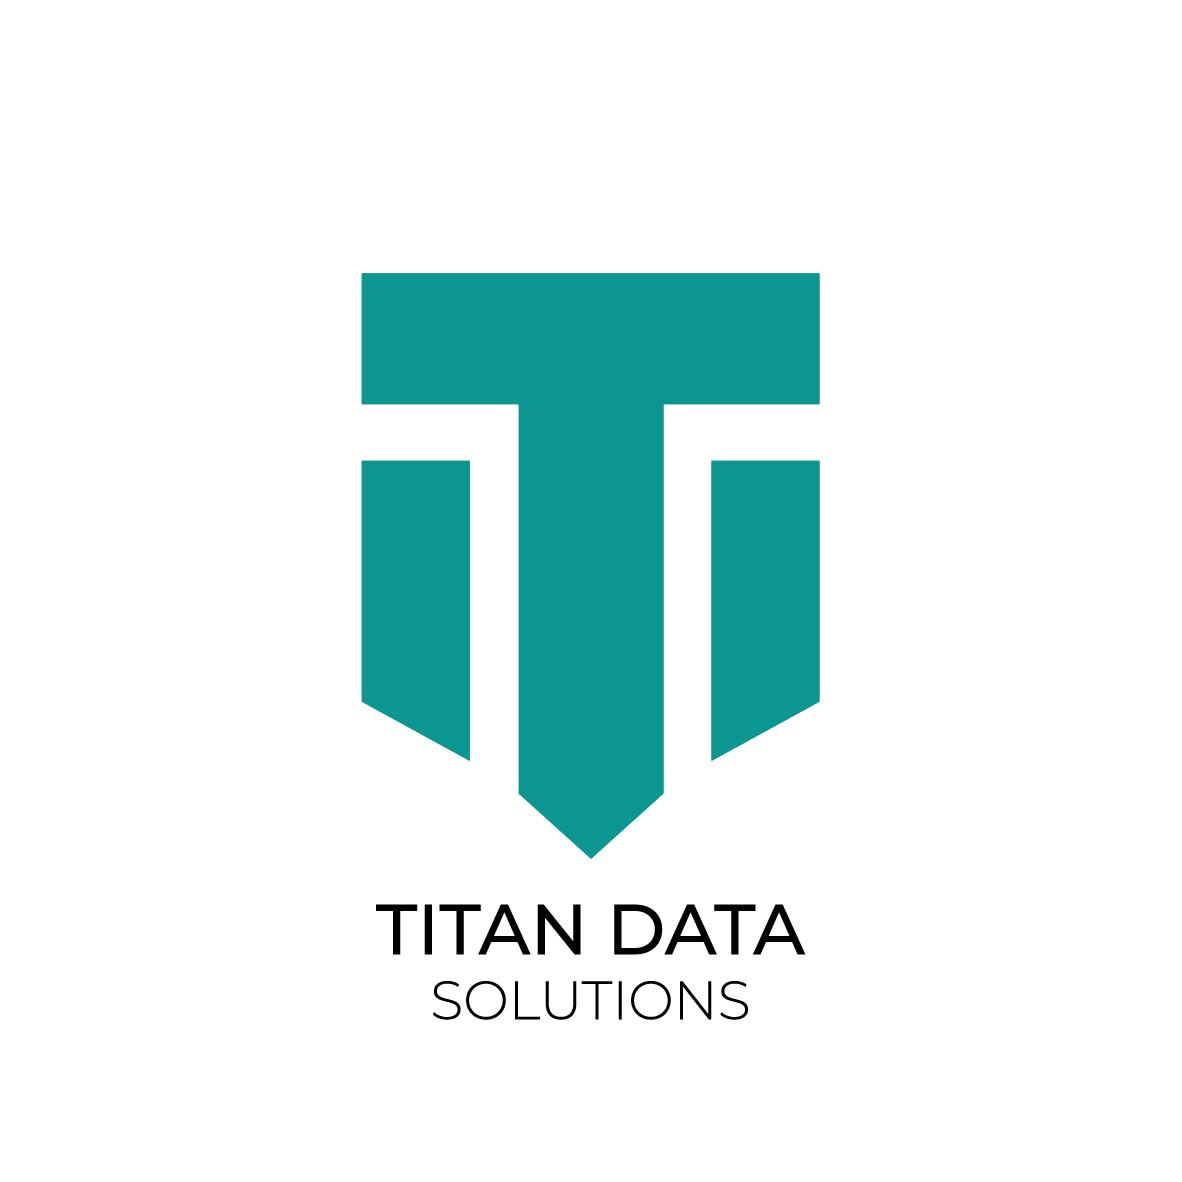 Titan Data Solutions